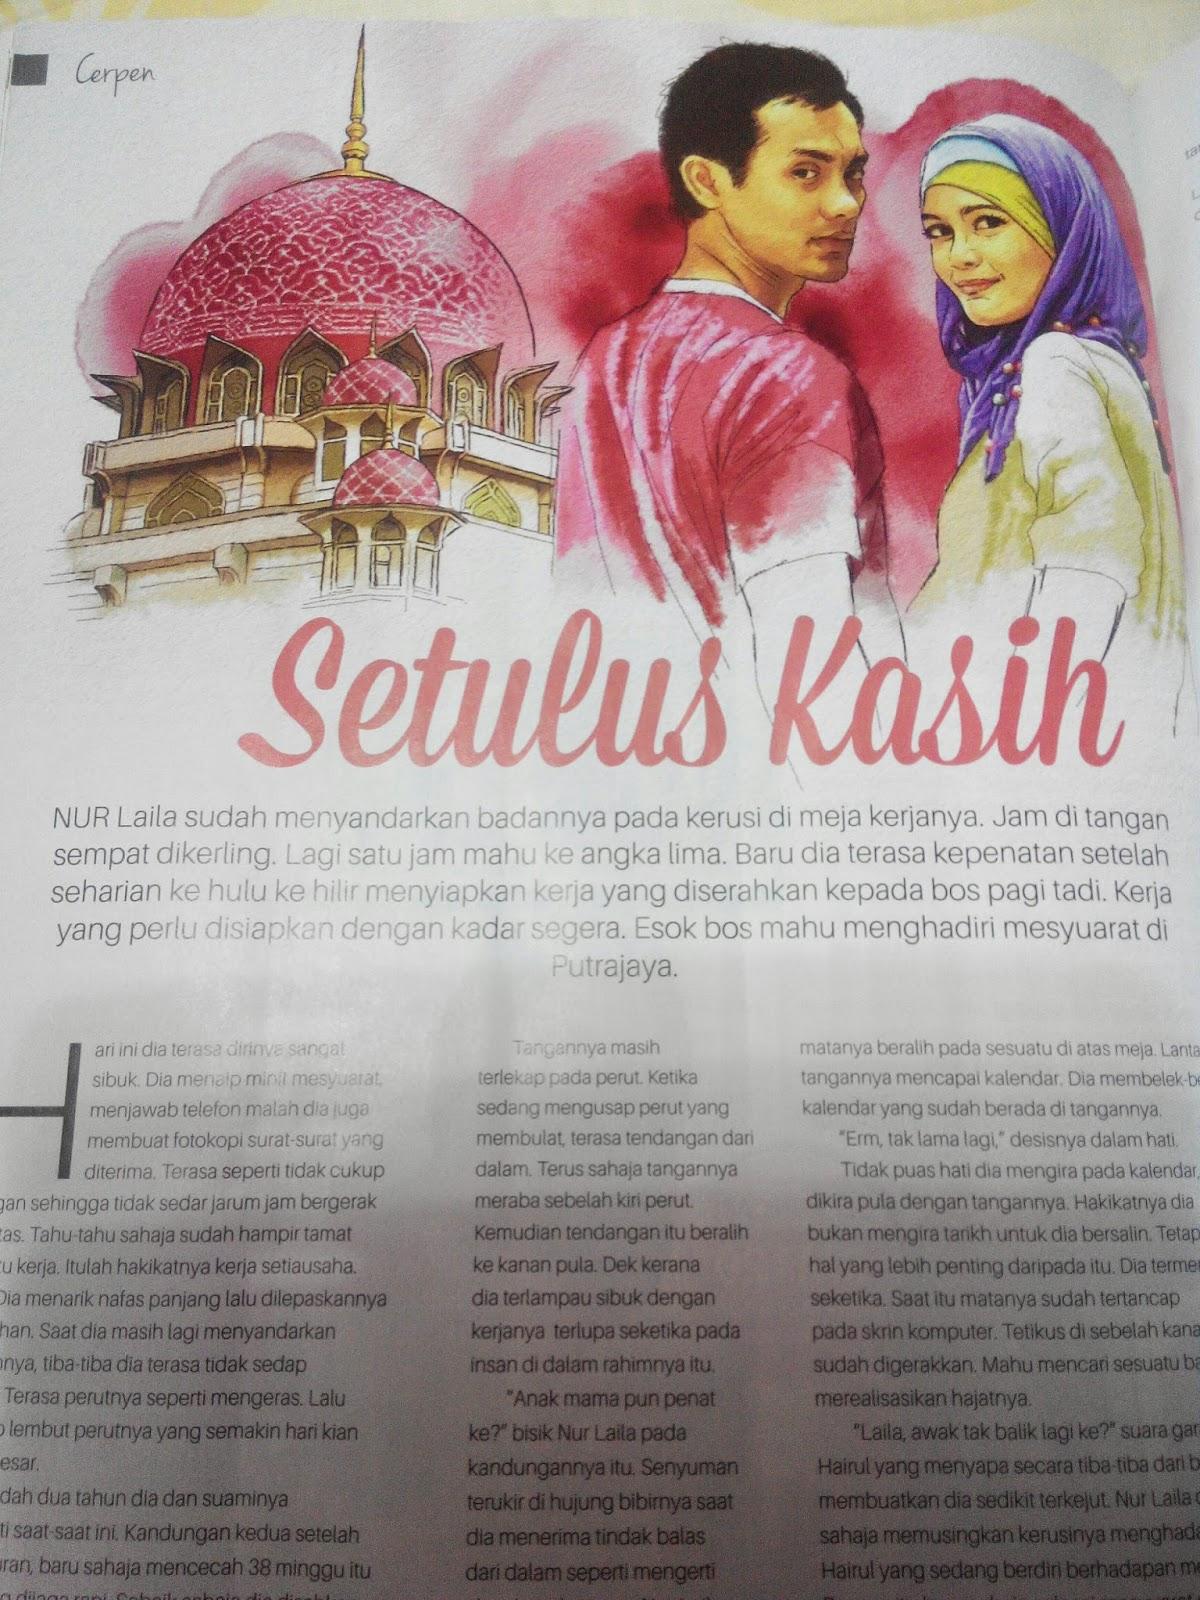 Cerpen Di Majalah Mingguan Wanita Bil 1633 (6-12 Mac 2015)